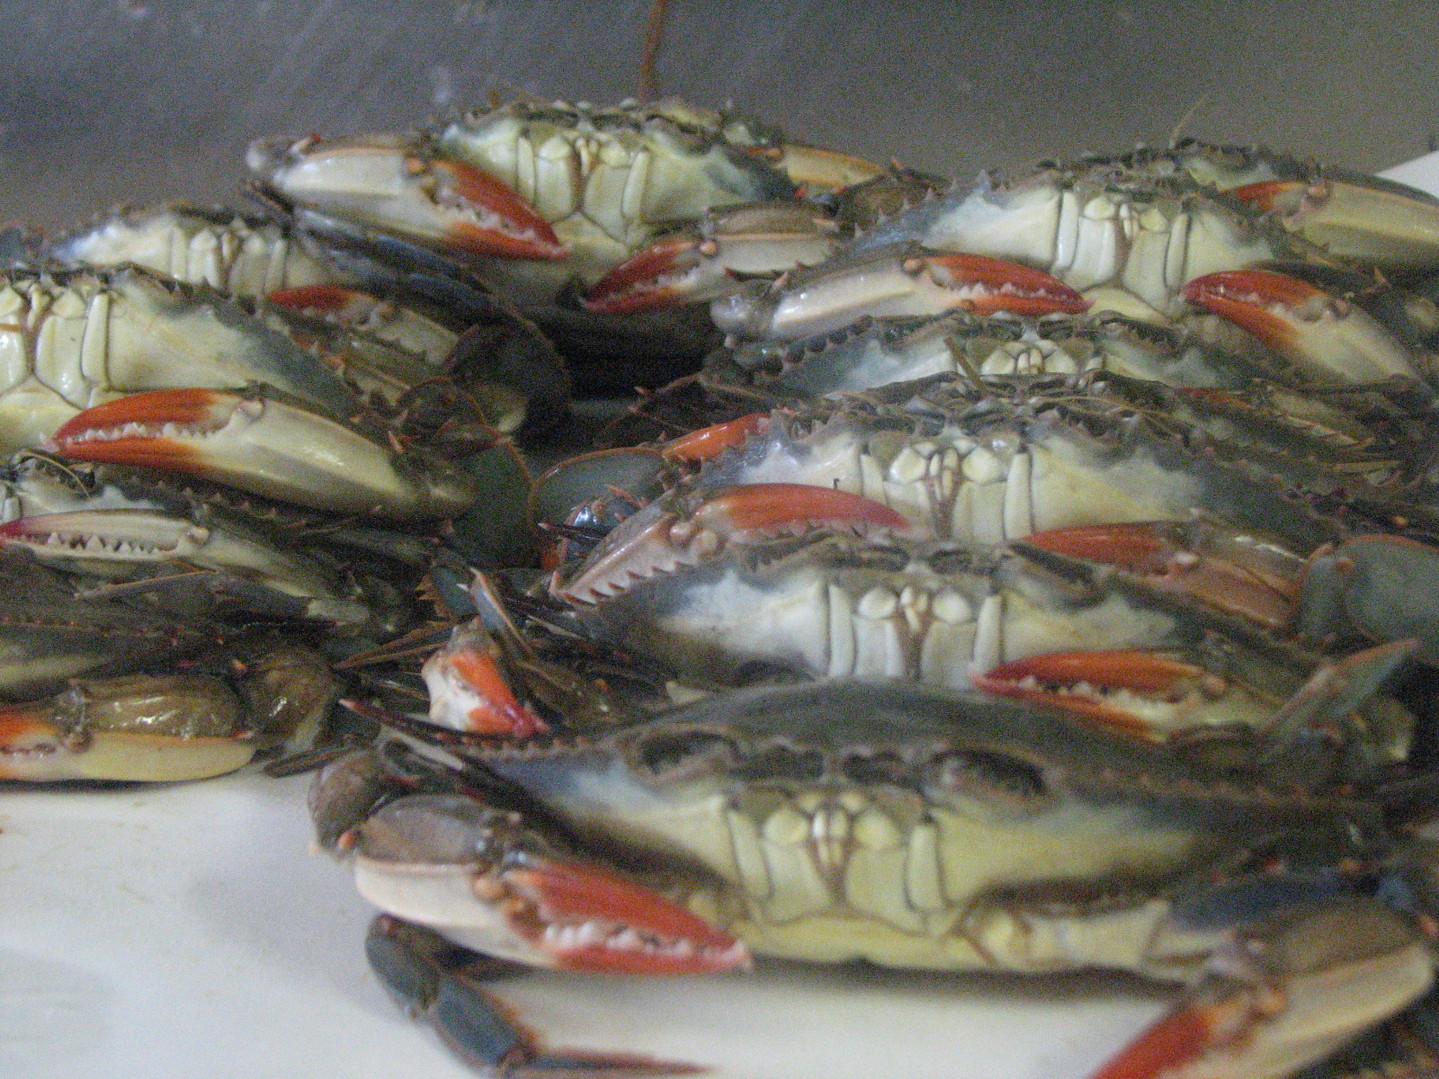 fish 183.JPG